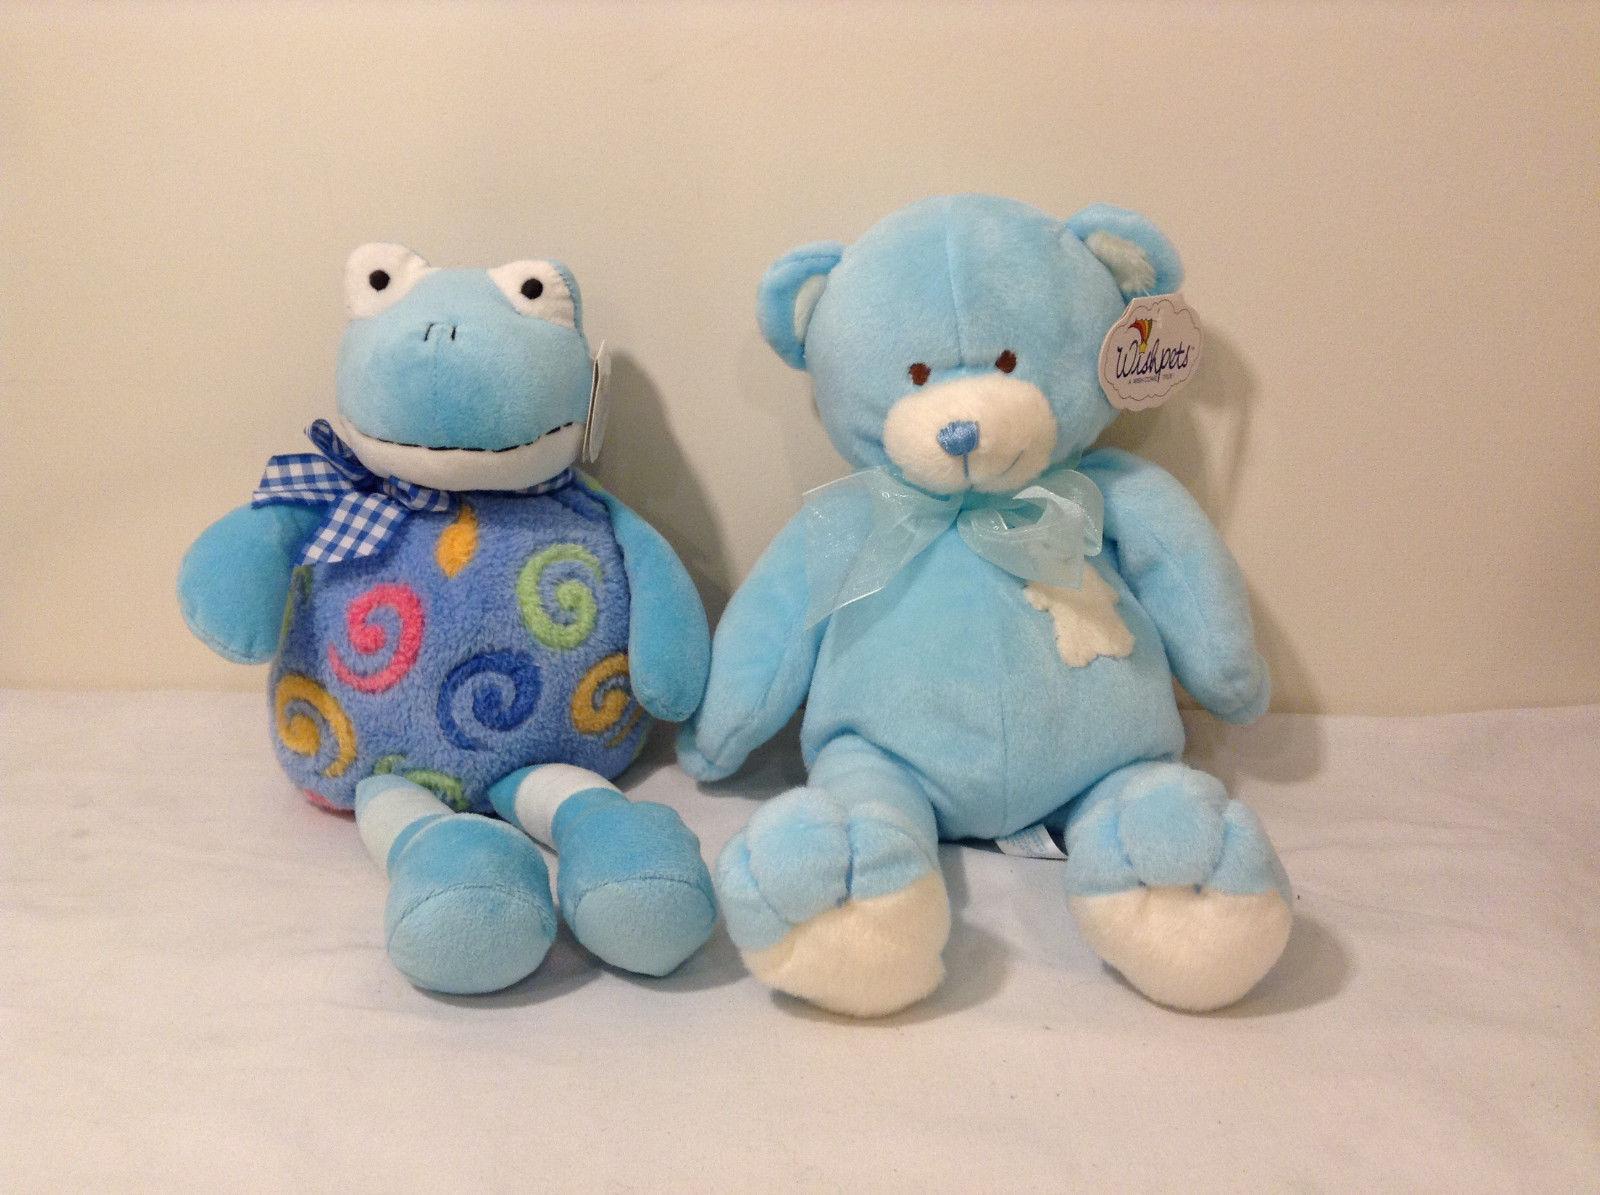 Set of 2 Wishpets Teddy Bear & Toad Frog Plush Stuffed Animal Toys Light Blue